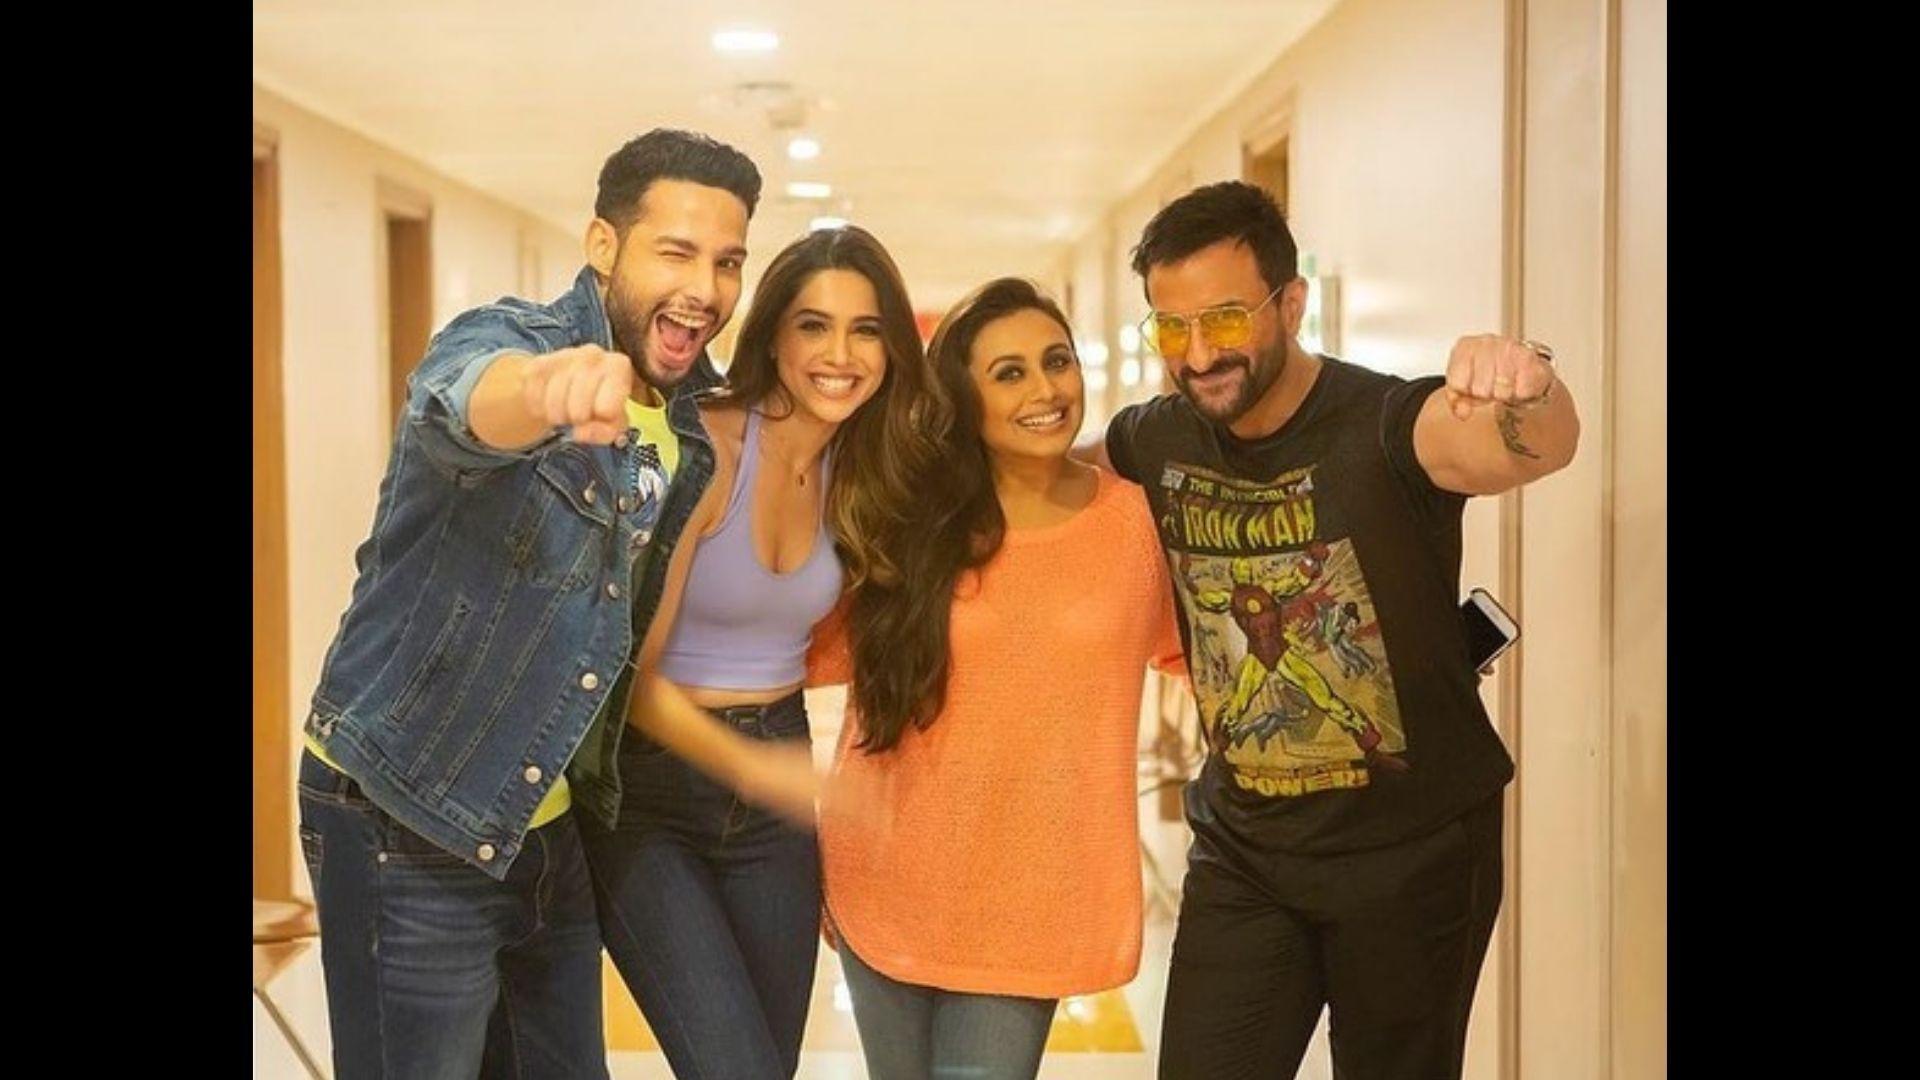 Bunty Aur Babli 2: Saif Ali Khan, Rani Mukerji, Siddhant Chaturvedi And Sharvari Begin Film Promotions; Get Goofy Together